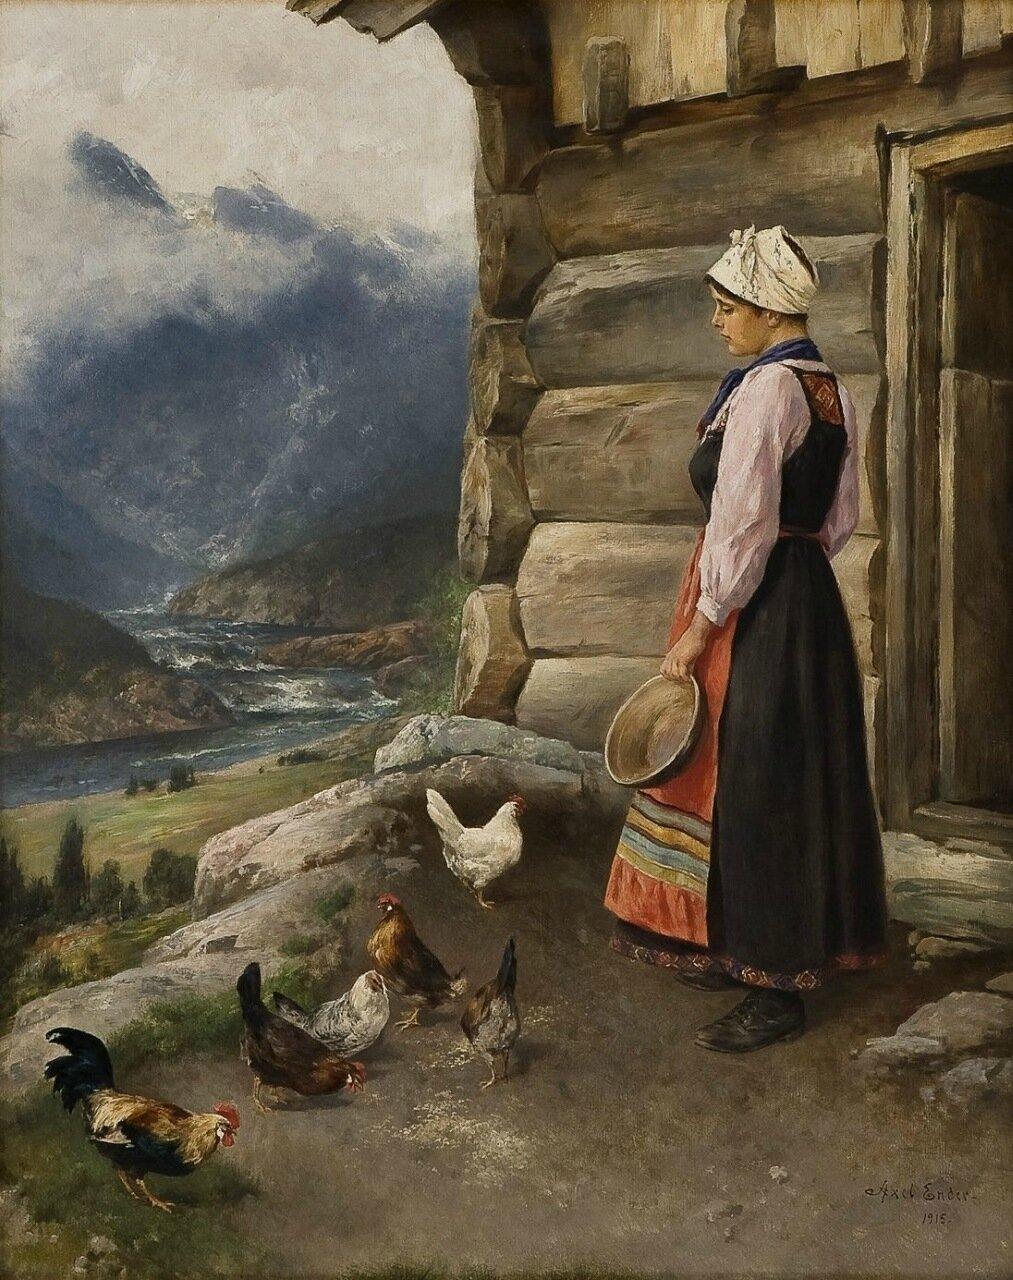 норвежская живопись: